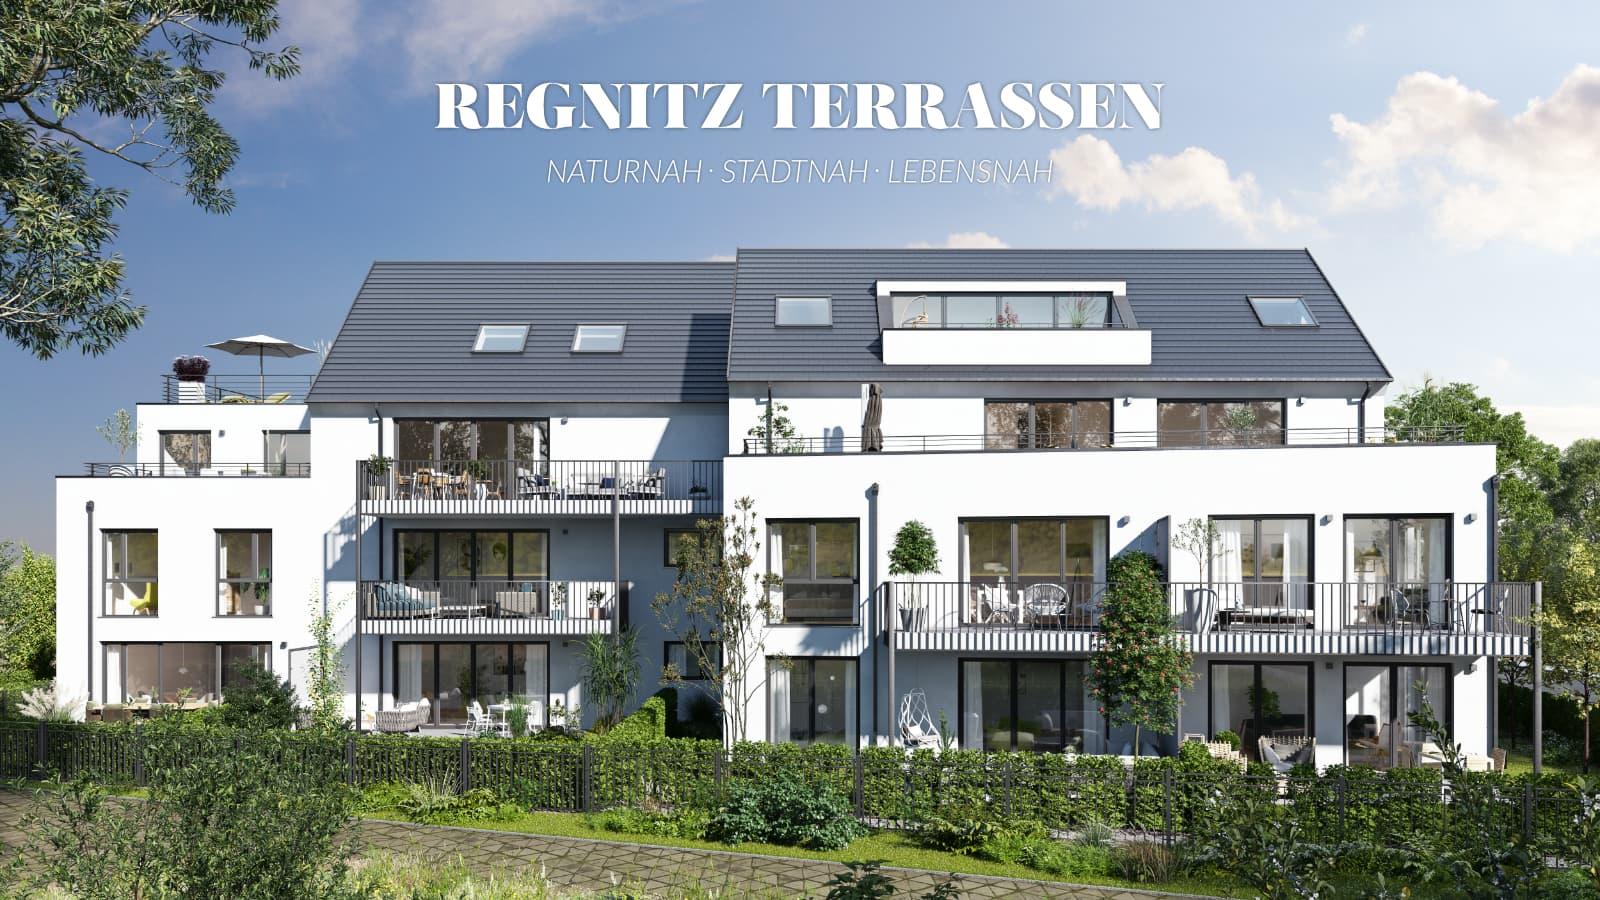 Regnitz Terrassen